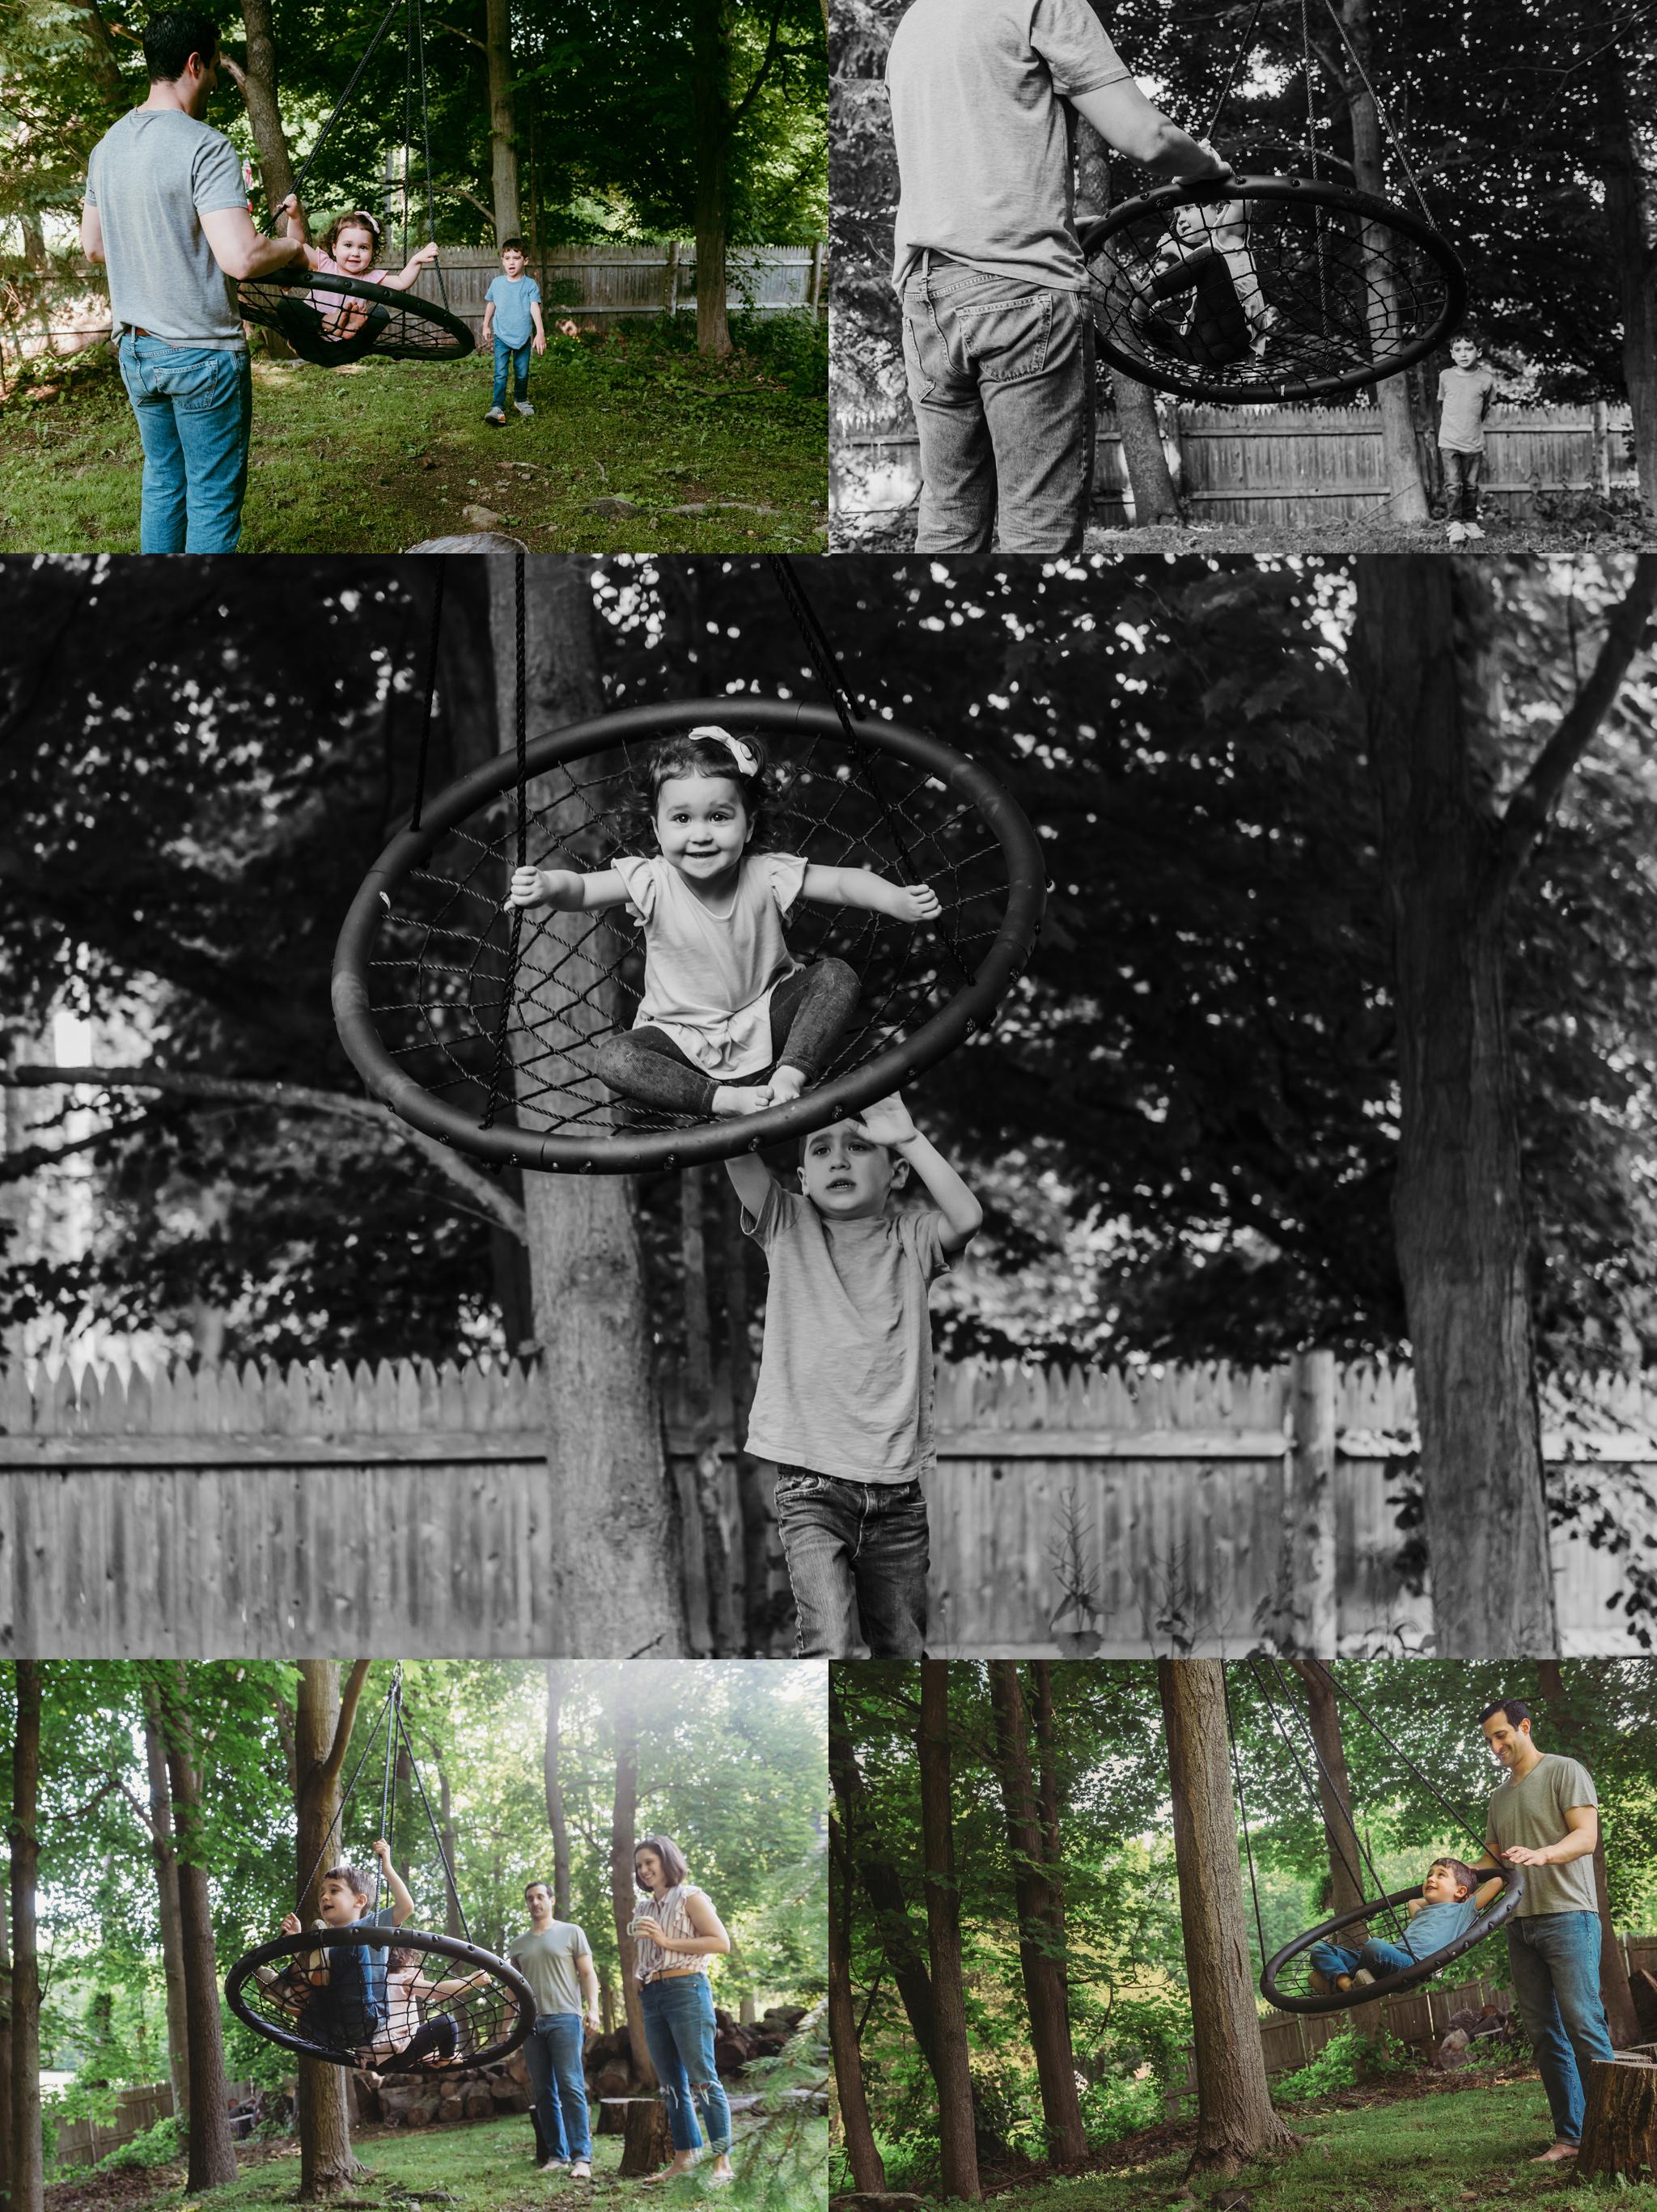 amy-drucker-lifestyle-family-photography-5.jpg